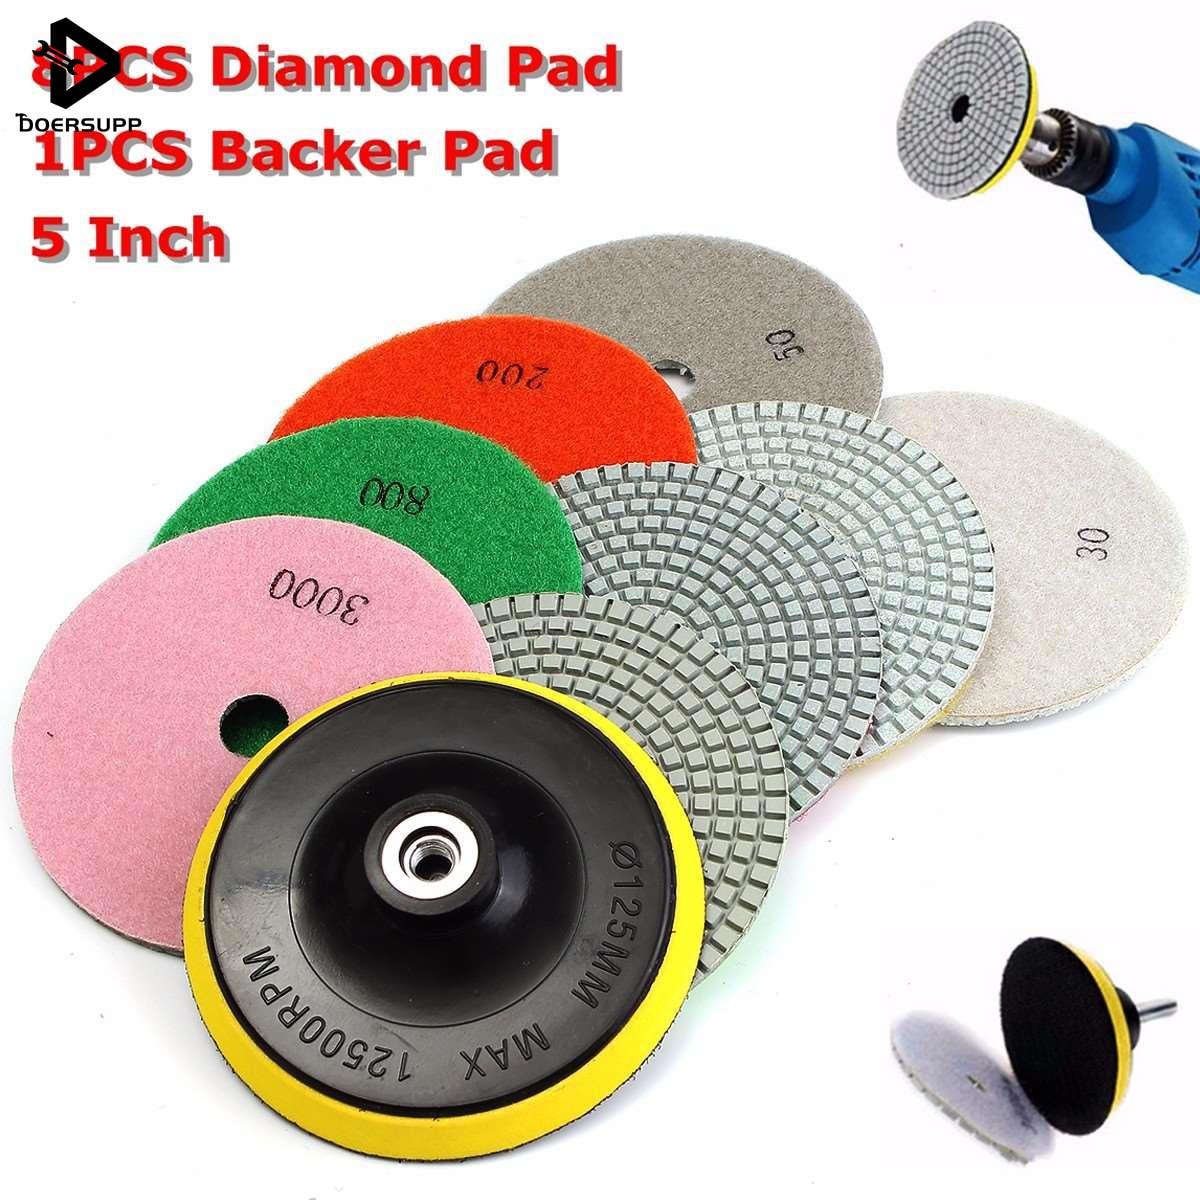 9pcs/set 5 Inch Diamond Polishing Pad Set Granite Marble Concrete Stone Tile Wet Dry For Granite Concrete Marble Stone Tiles бордюр versace marble torello marrone 4x58 5